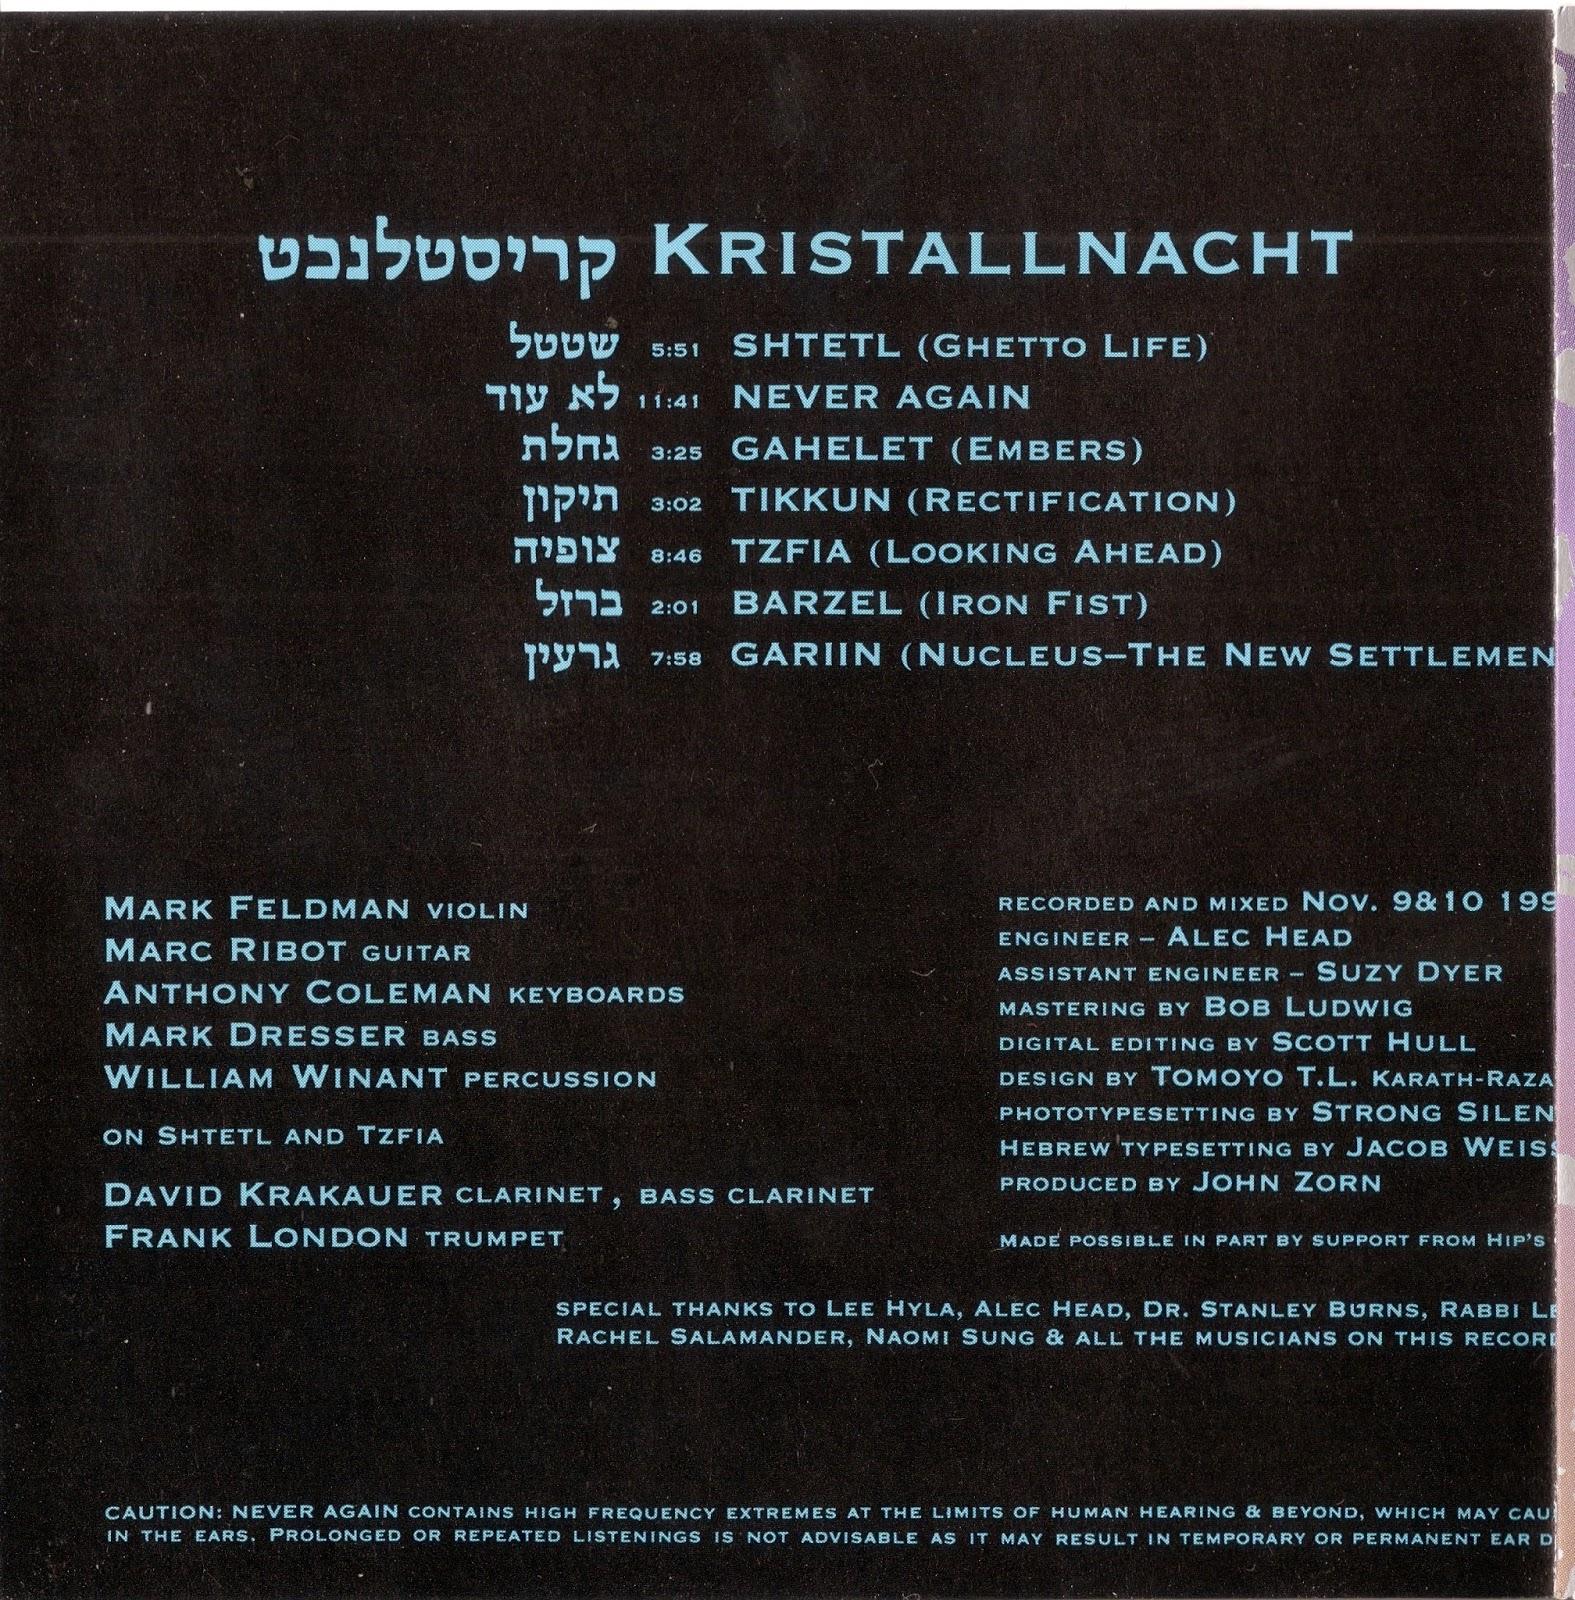 John Zorn - Kristallnacht